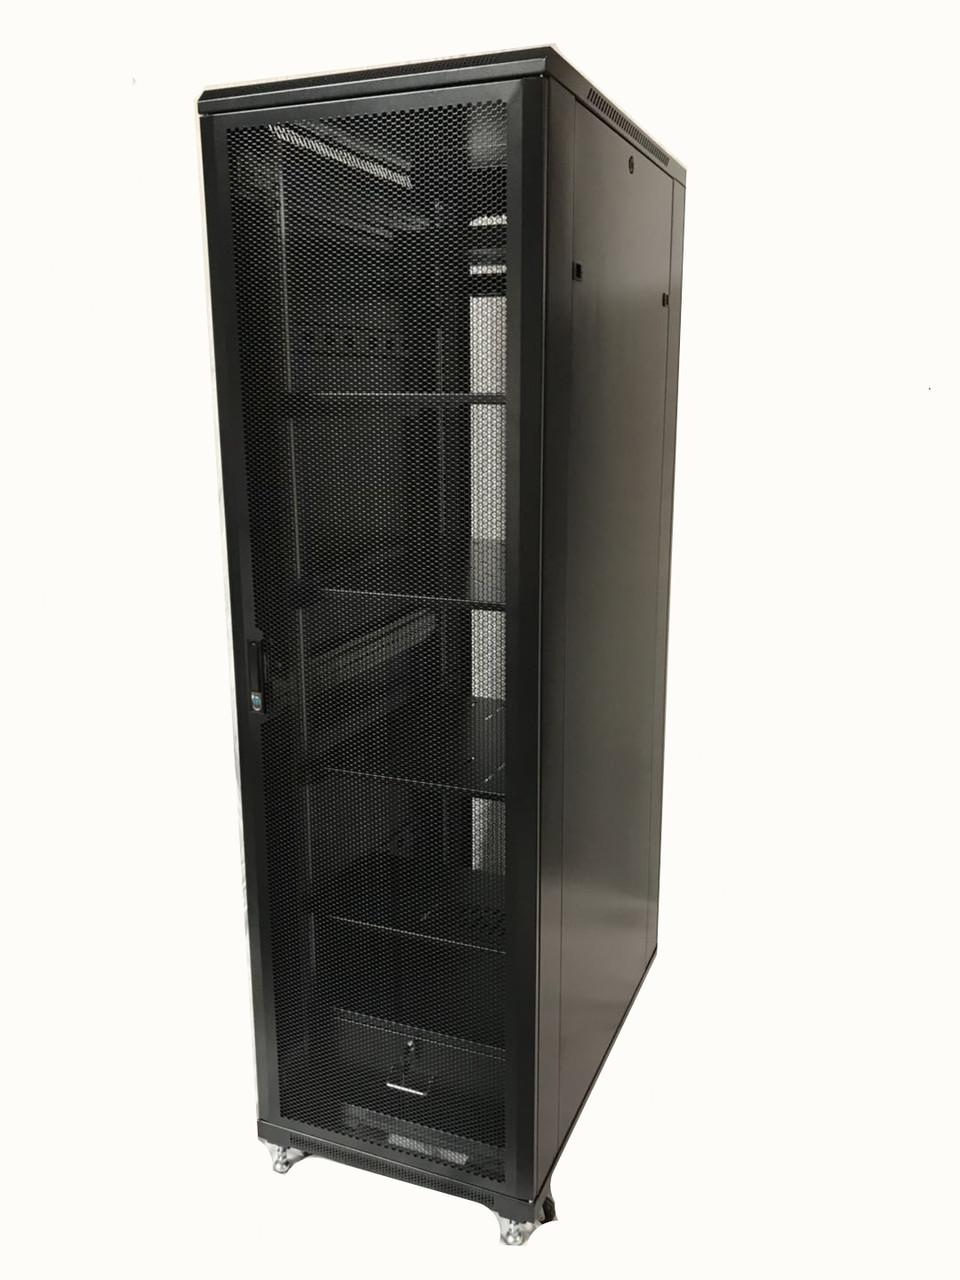 Raising Electronics Server Rack 4 Post Open Rack Frame Rack Enclosure 19 Inch Adjustable Depth Cold Rolled Steel(42U,82Inch Height)